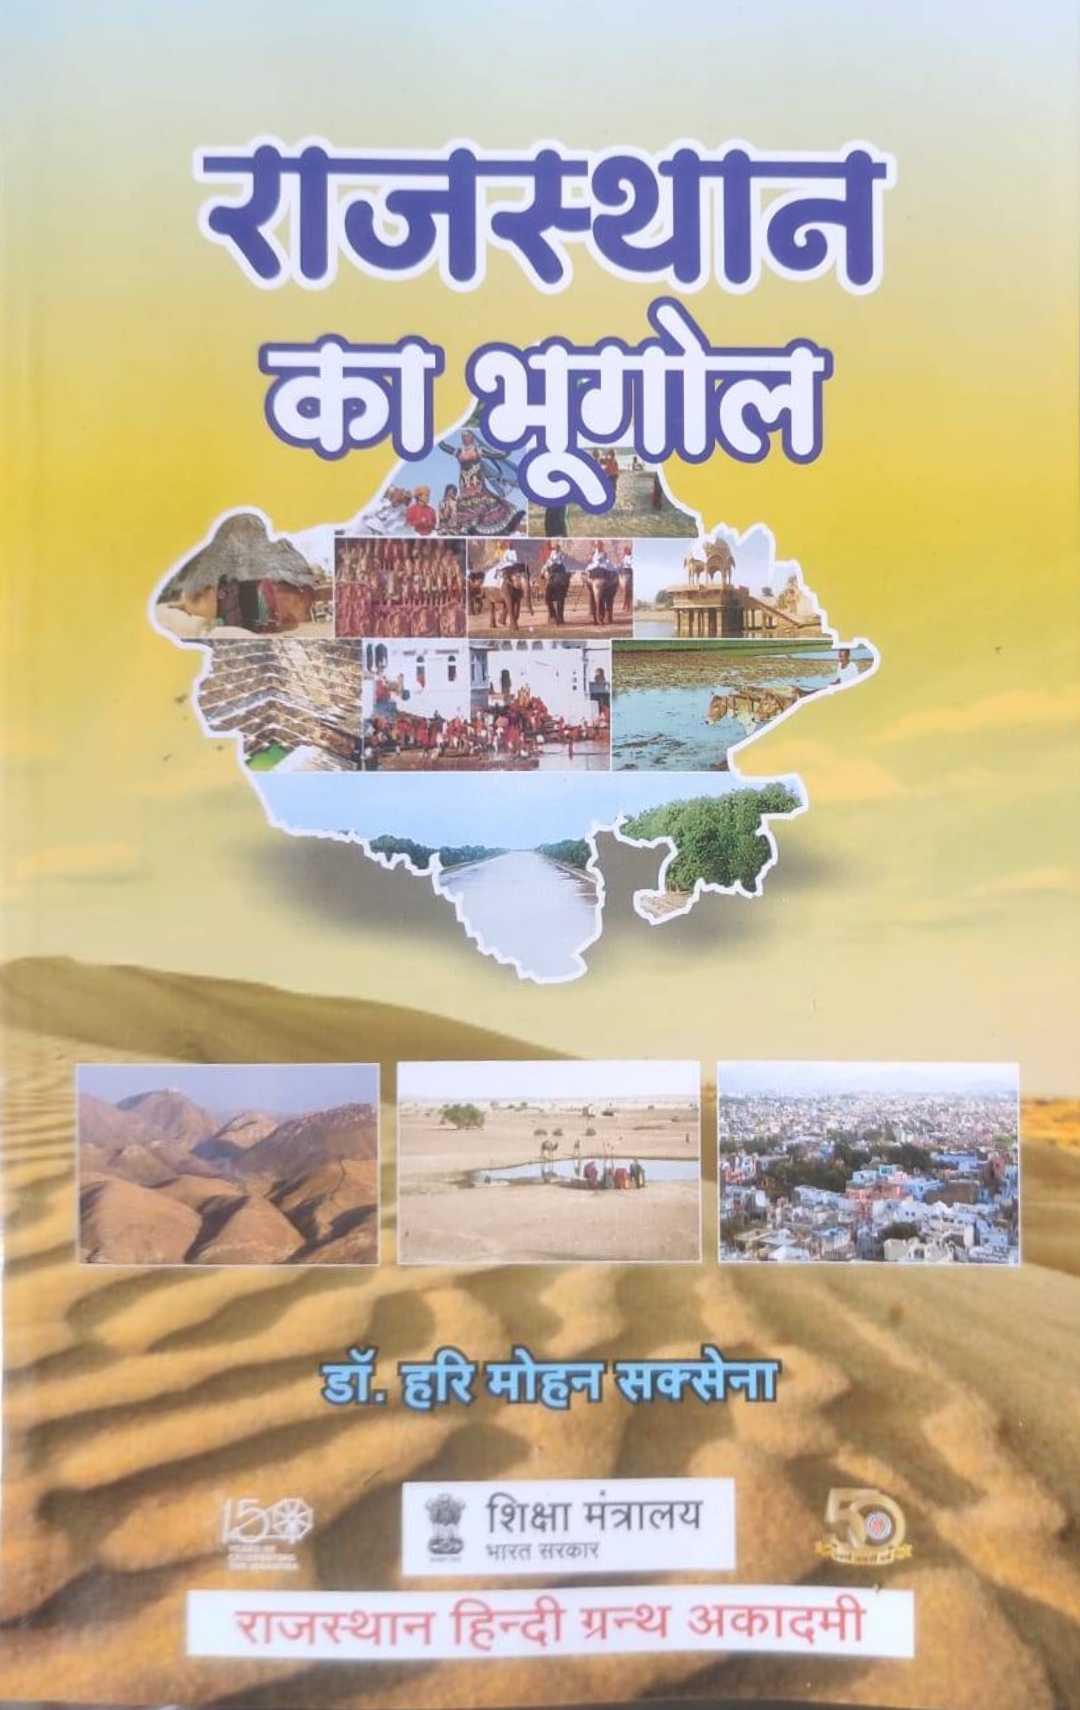 RAJASTHAN KA BHUGOL BY Dr. HARIMOHAN SAKSENA